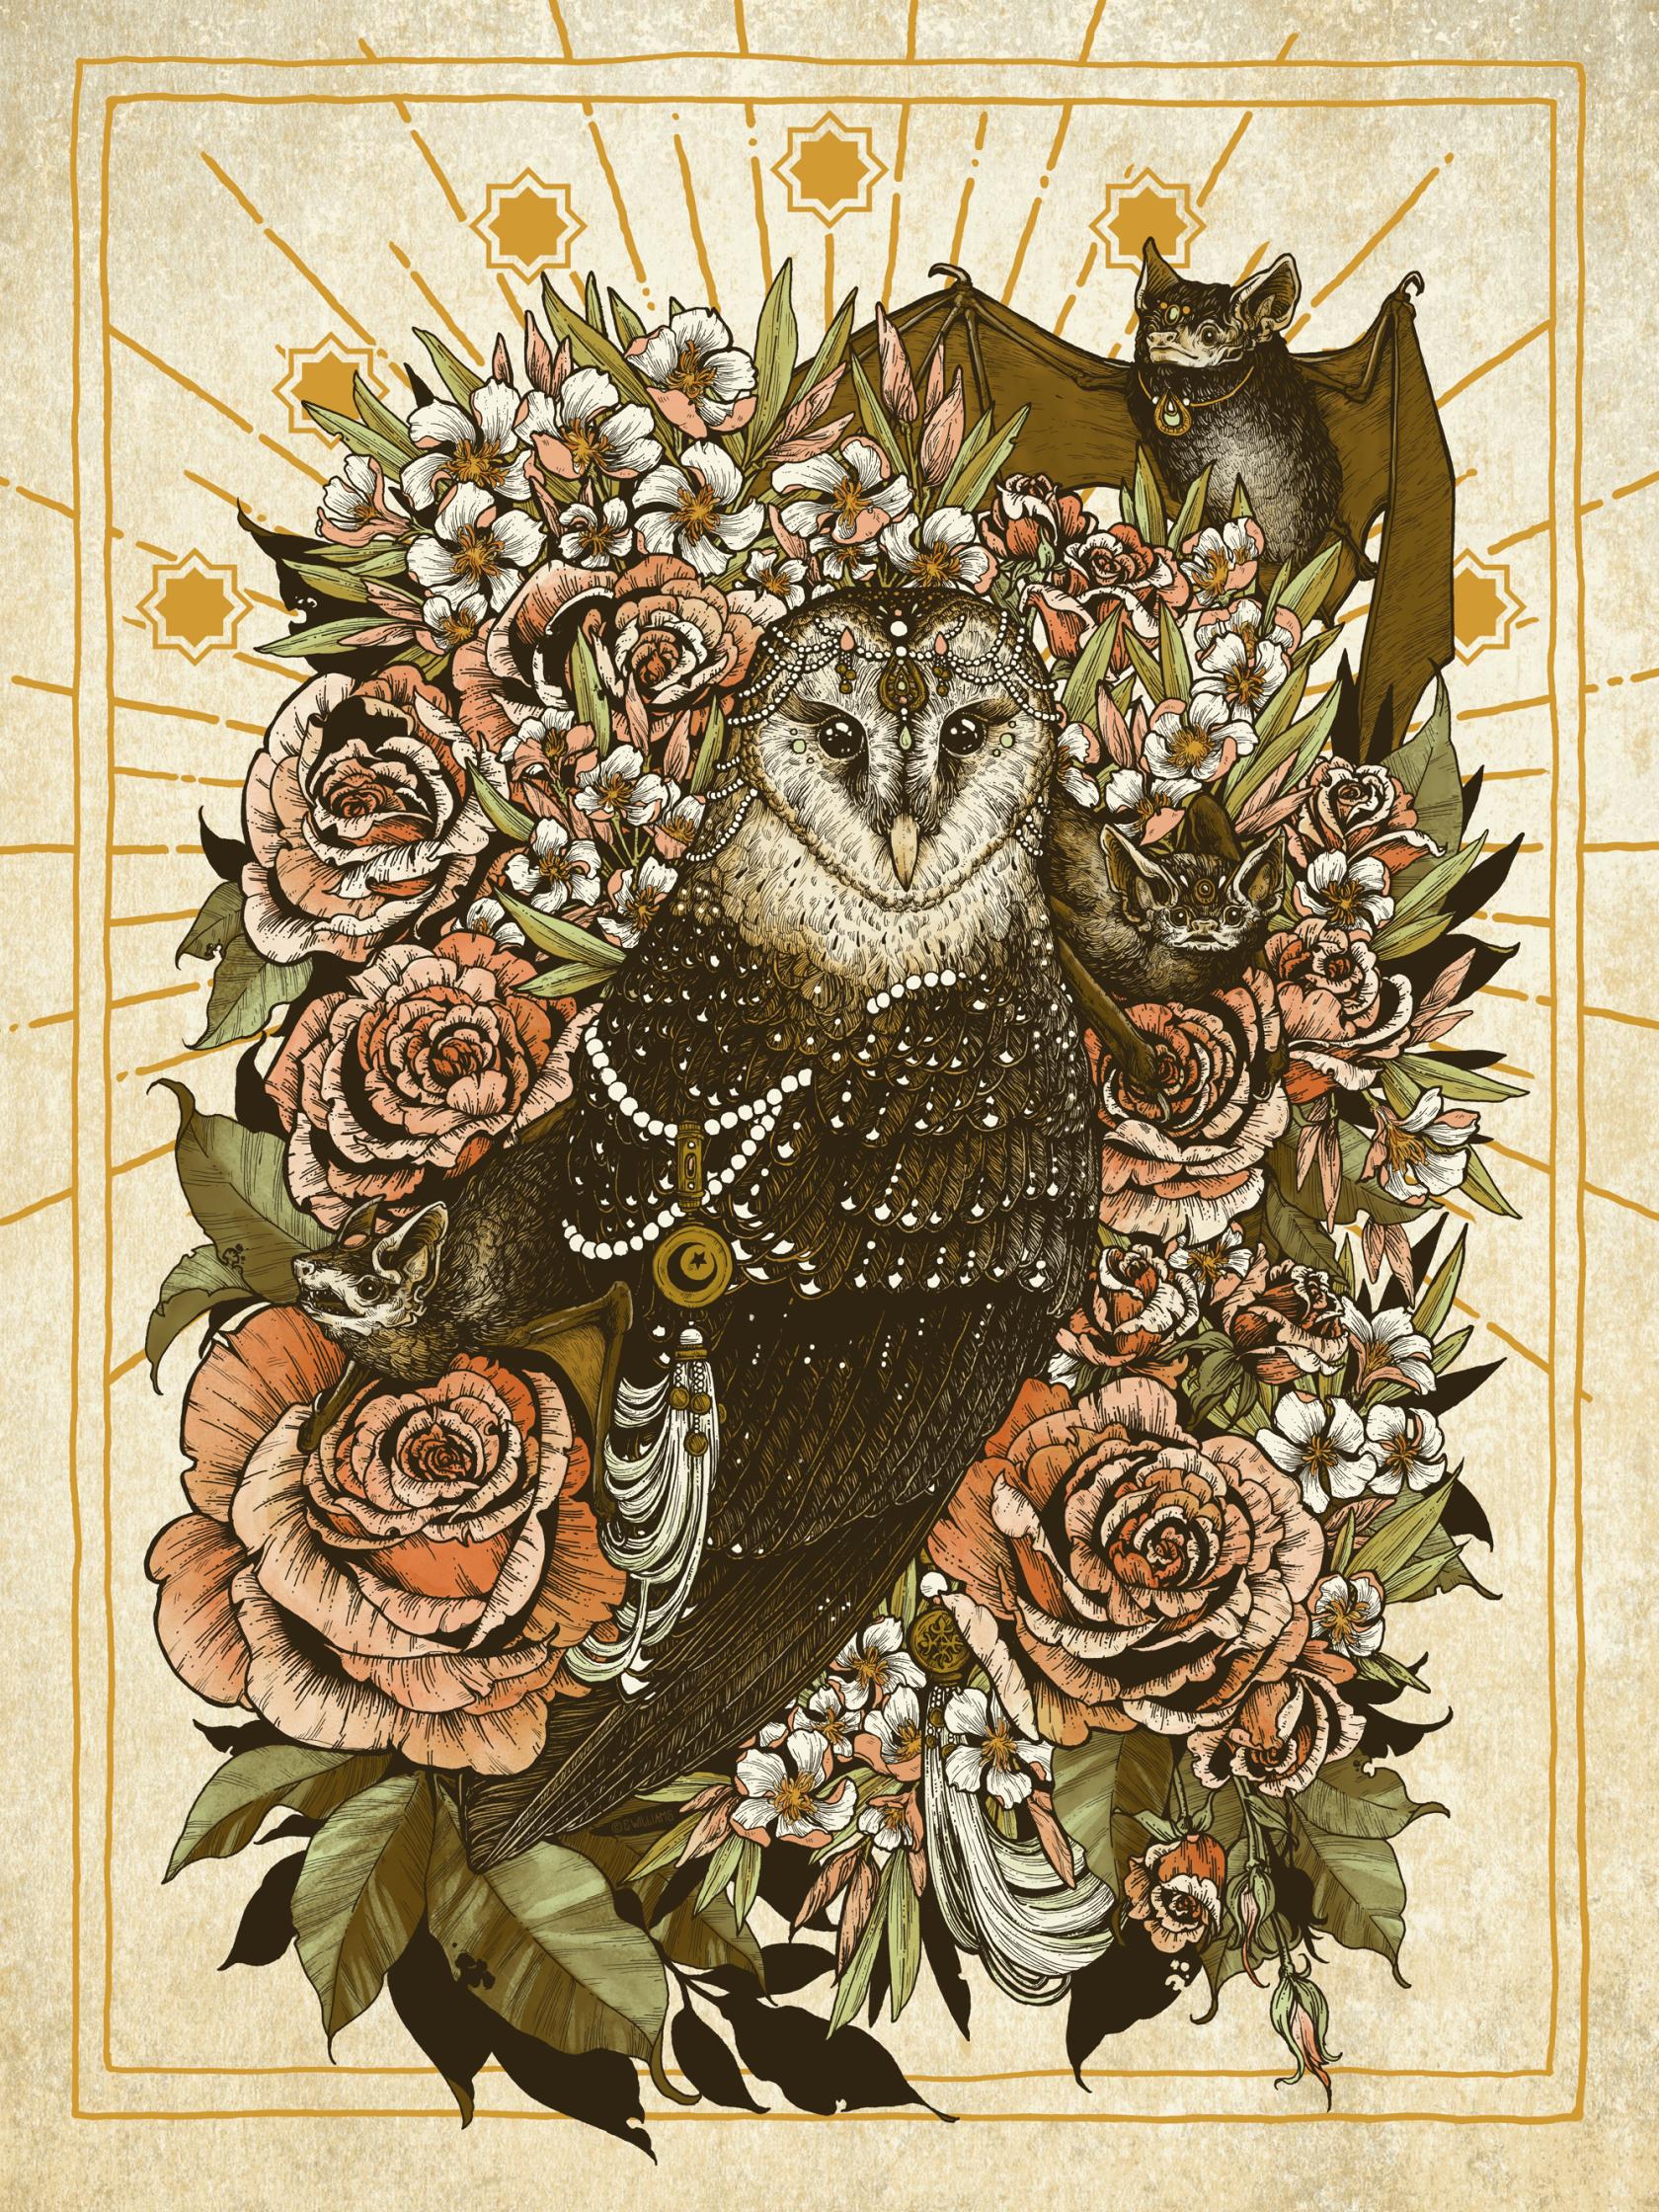 American Poster Institute - SXSW - Flatstock 59 - Peace be Upon You Art Print - Erica Williams_Seps.jpg